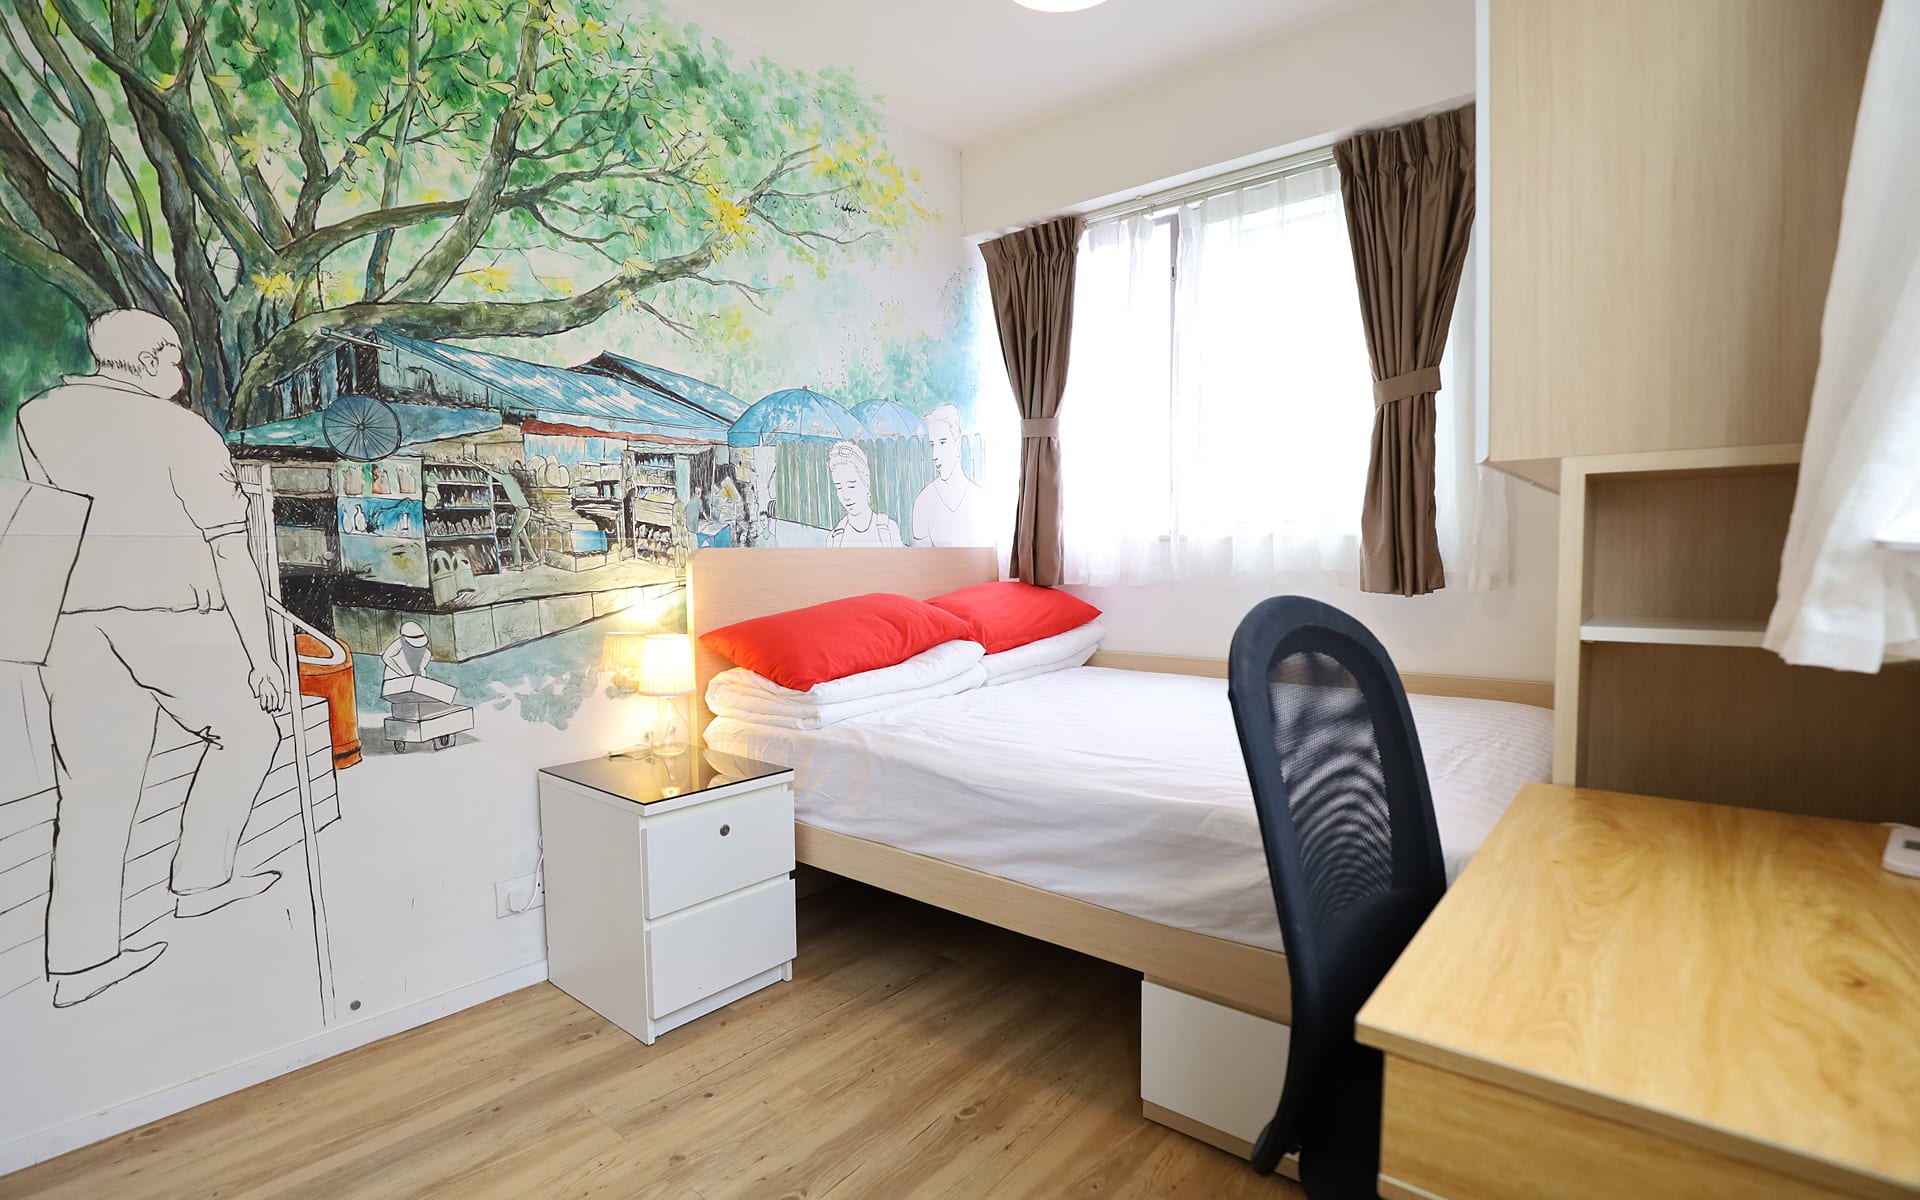 hk_service_apartment_18619541021589362127.jpg